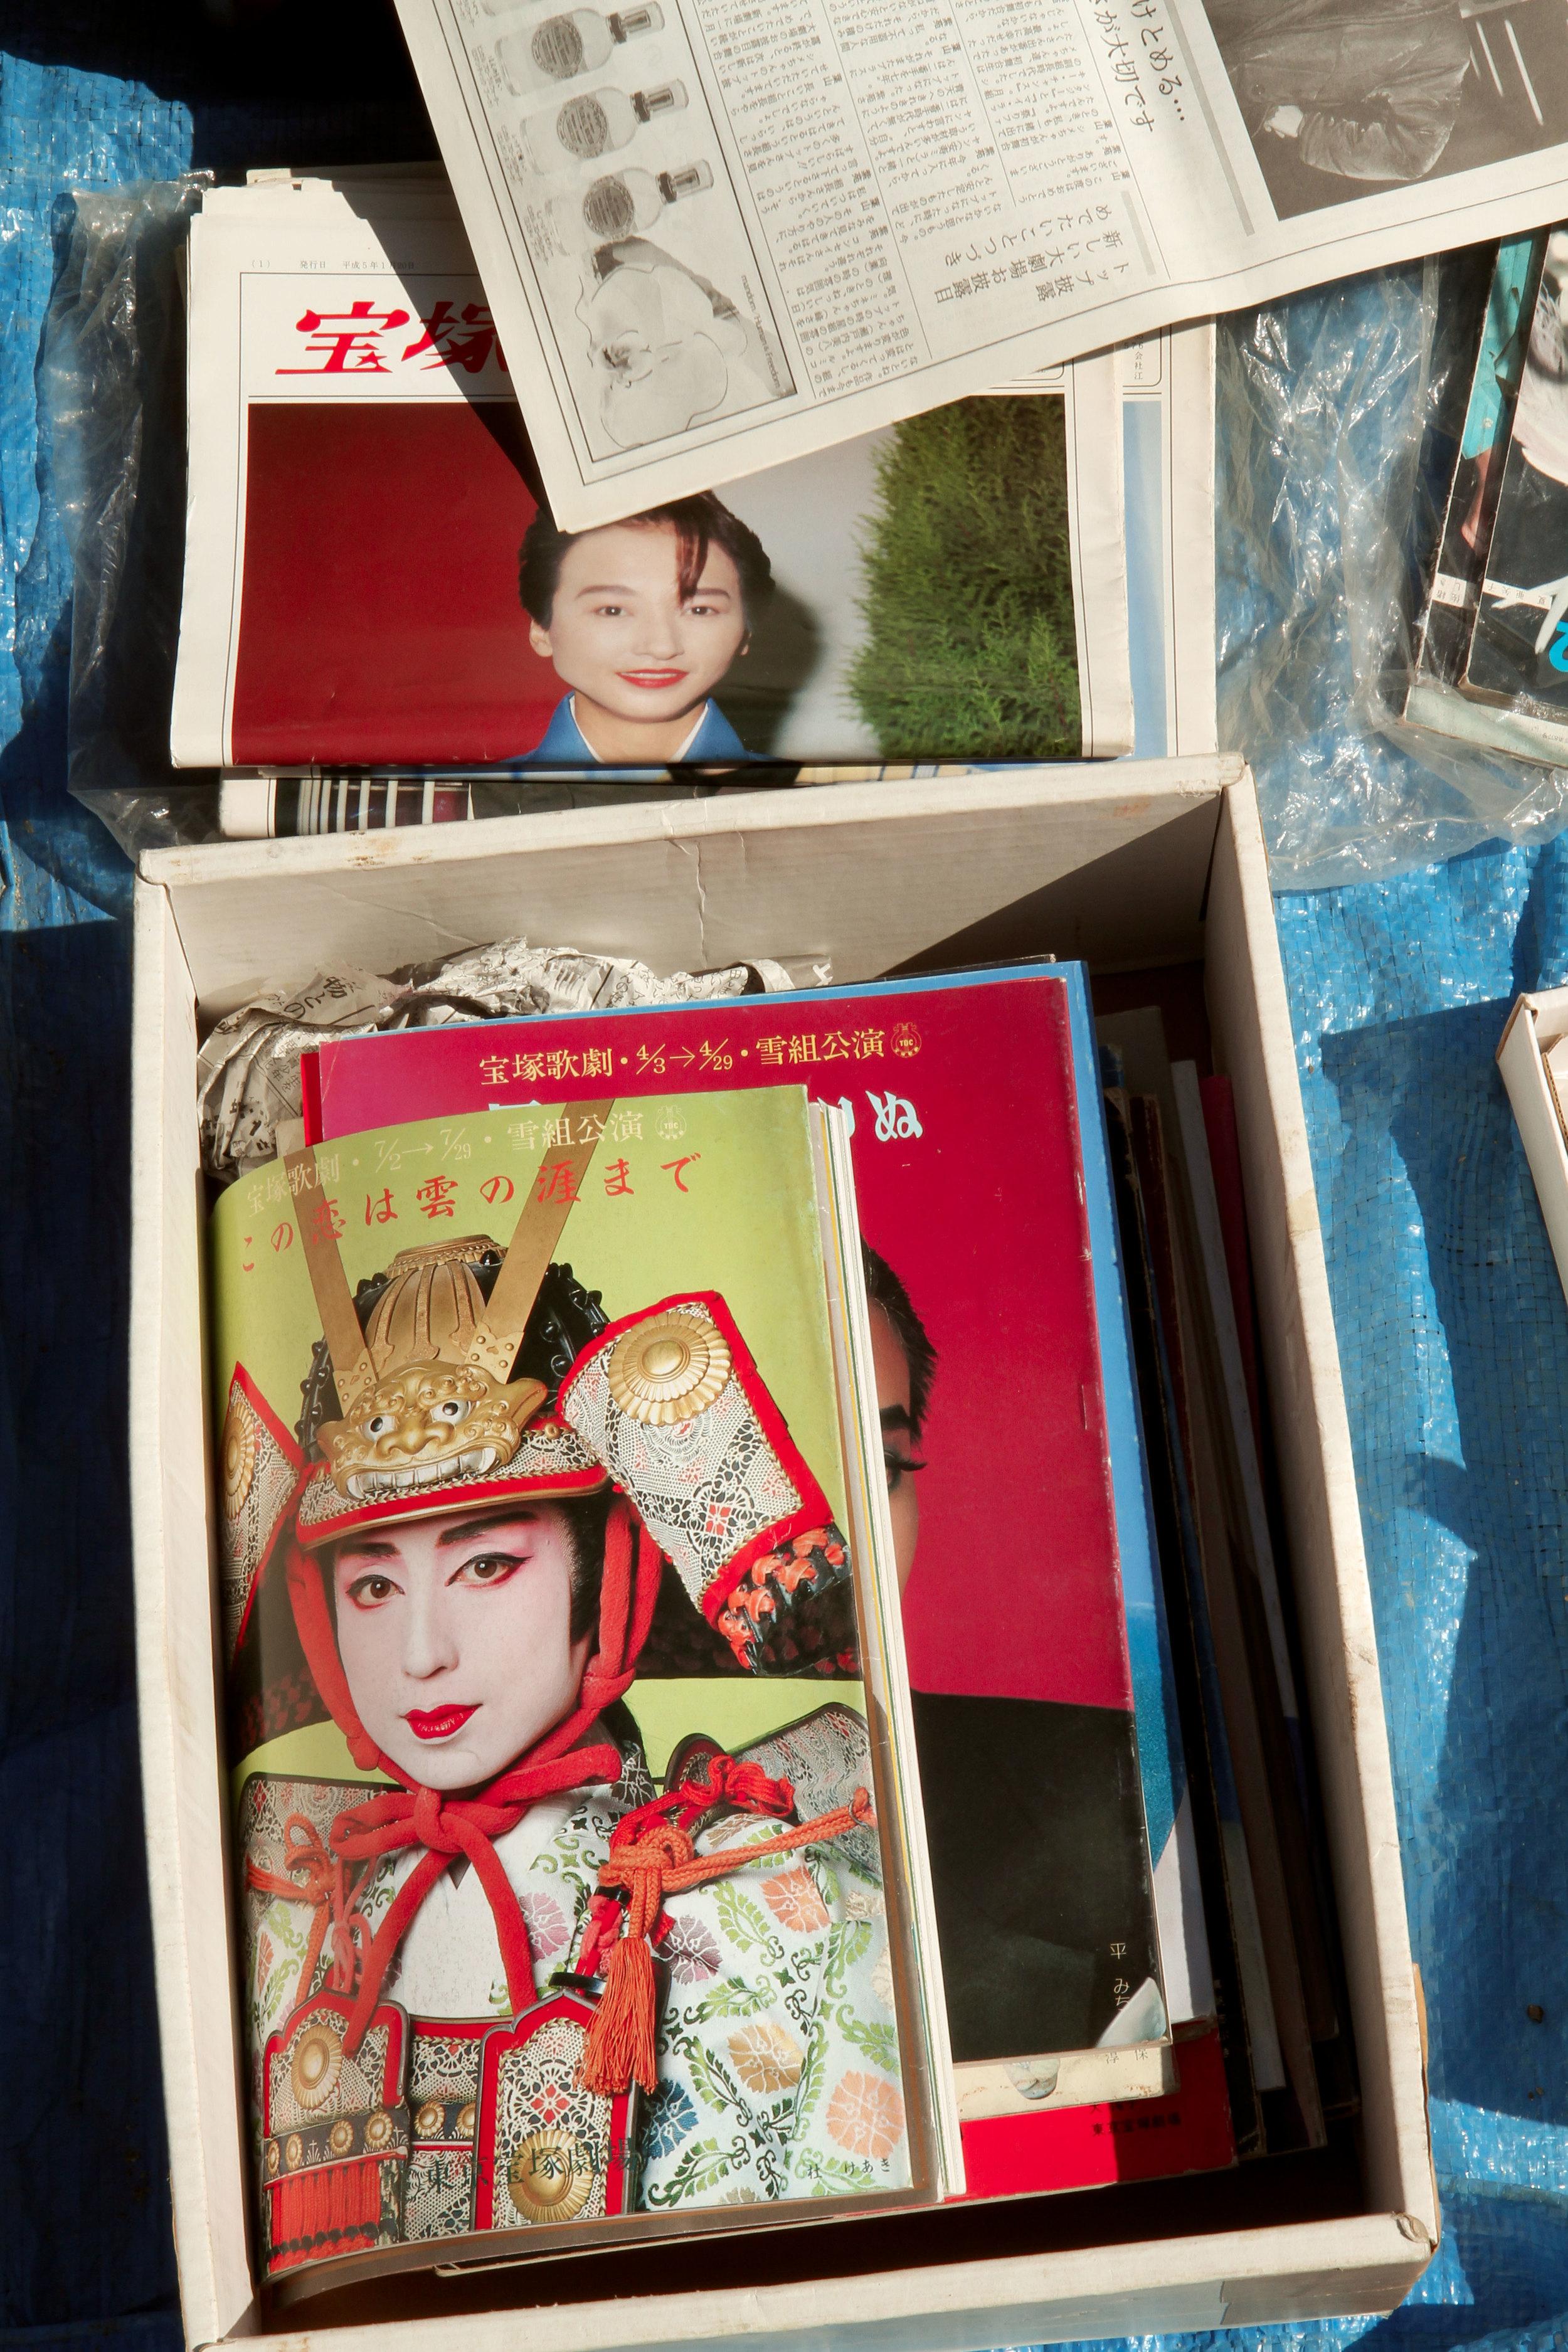 Magazines-at-Flee-Market.jpg